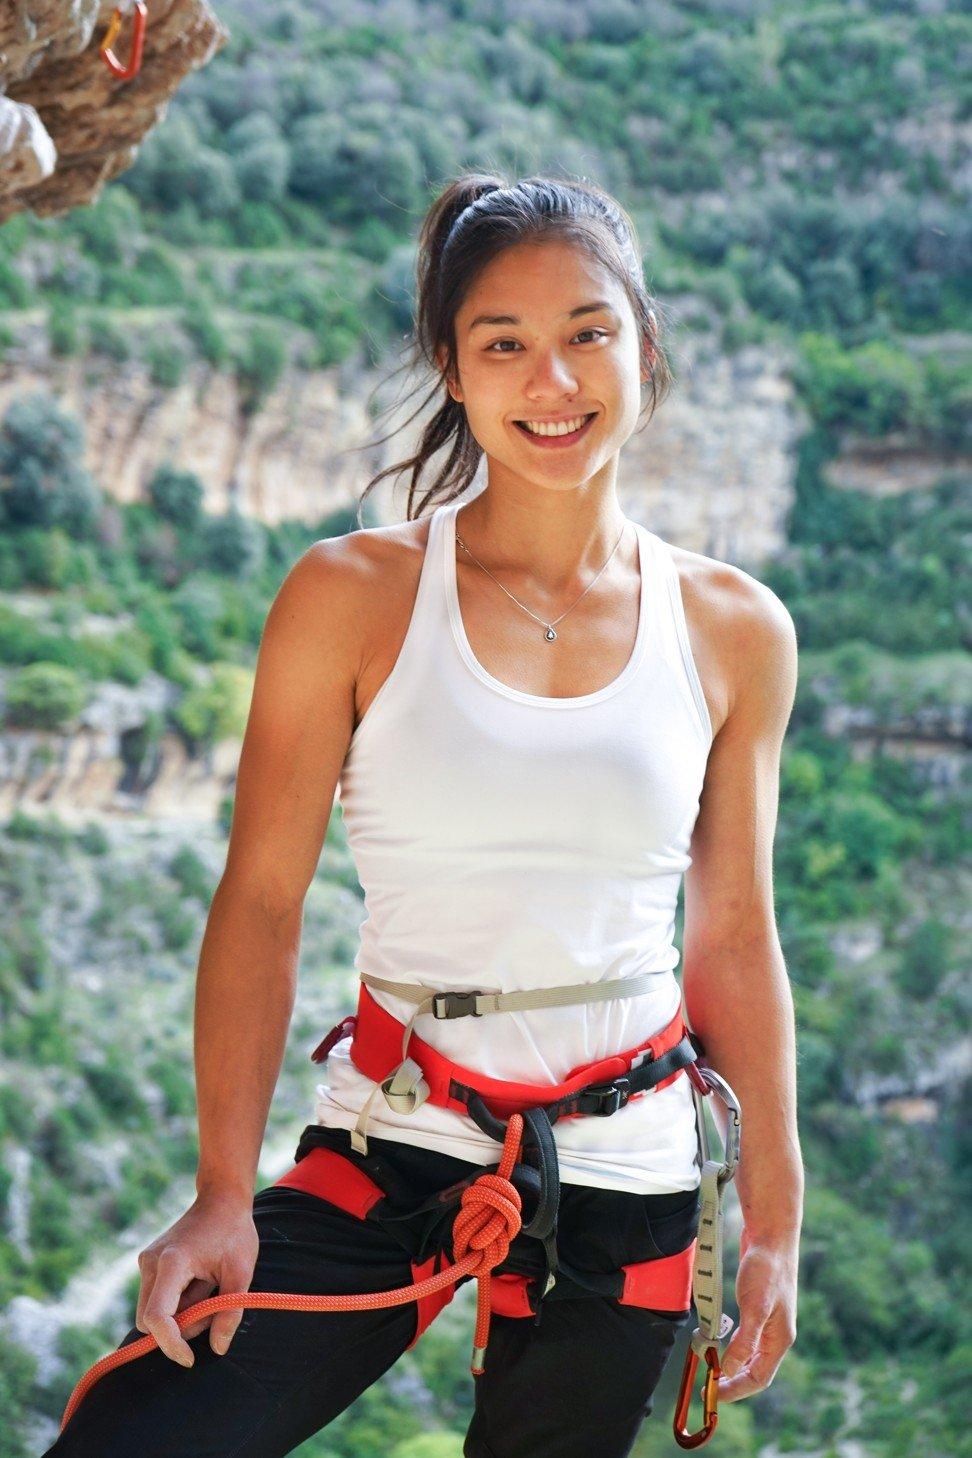 Canadian climber Alannah Yip during an outdoor climbing trip this year. Photo: JJ Mah